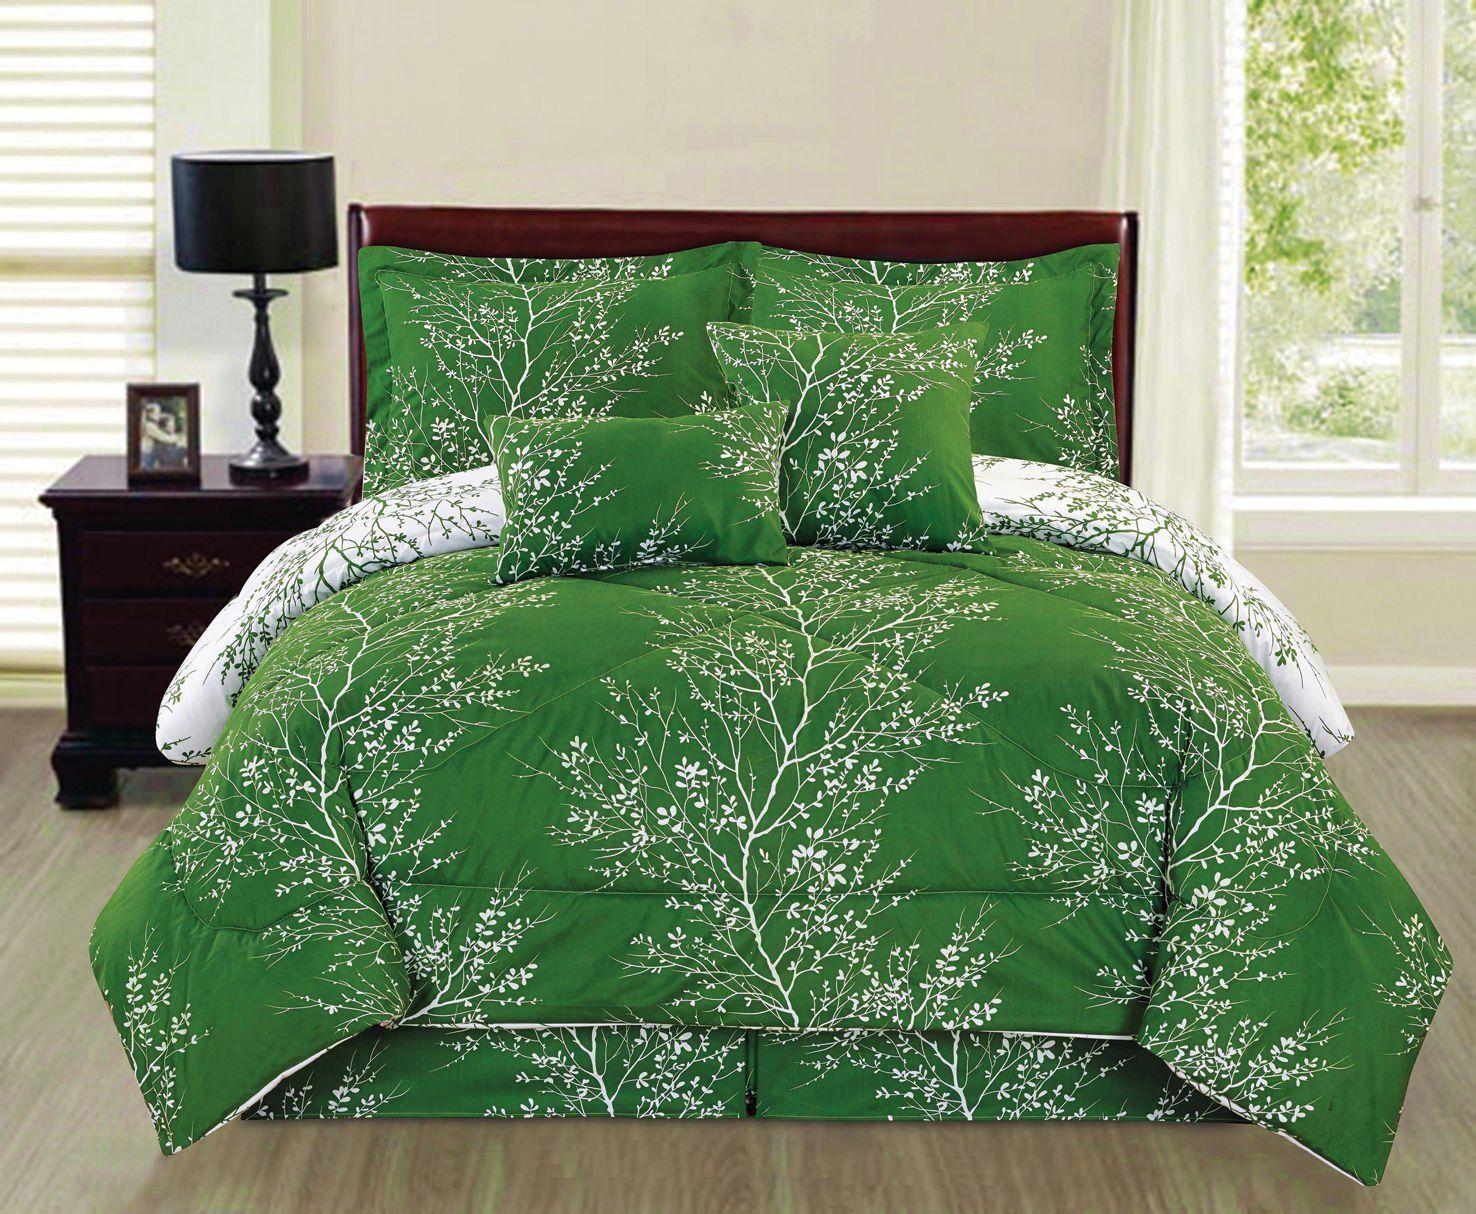 Robot Check Comforter Sets Green Comforter King Size Comforter Sets